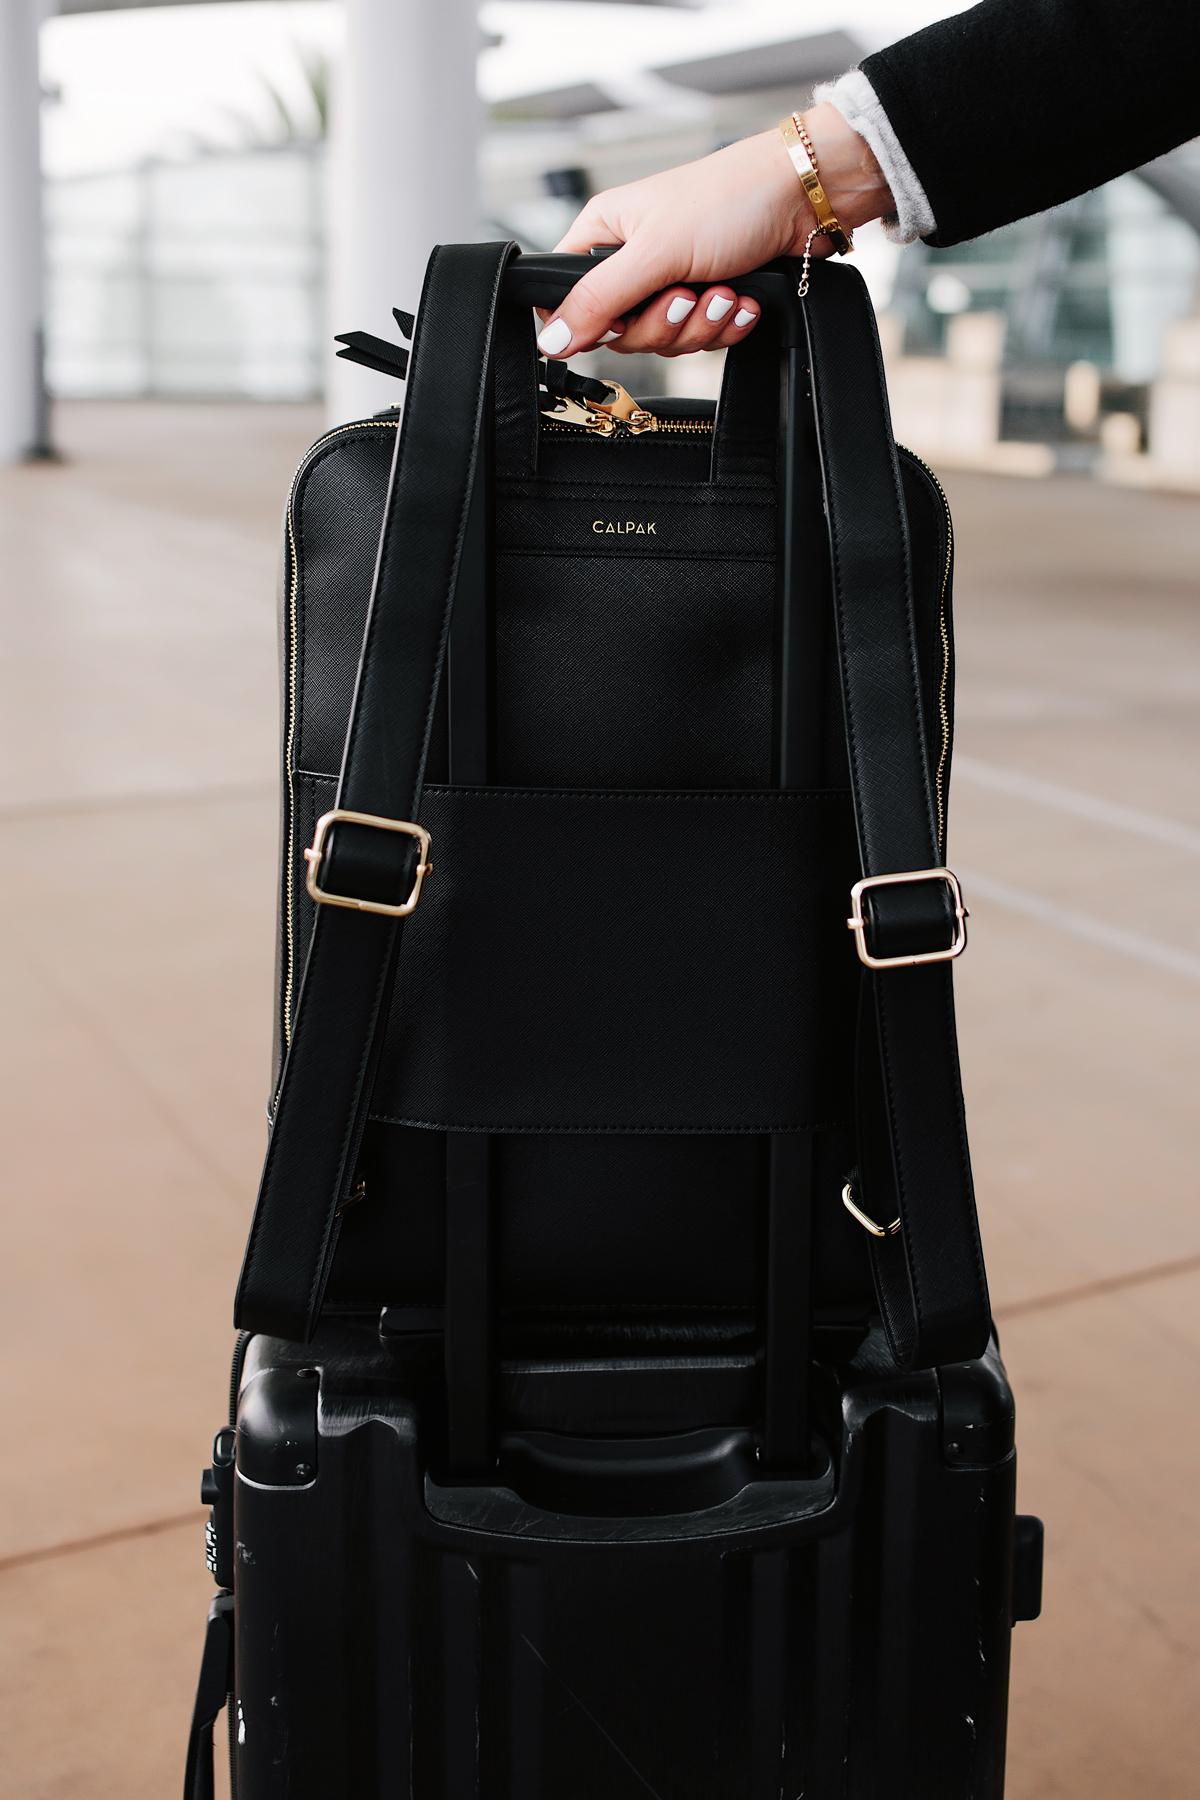 Calpak Kaya Black Backpack Airport Style